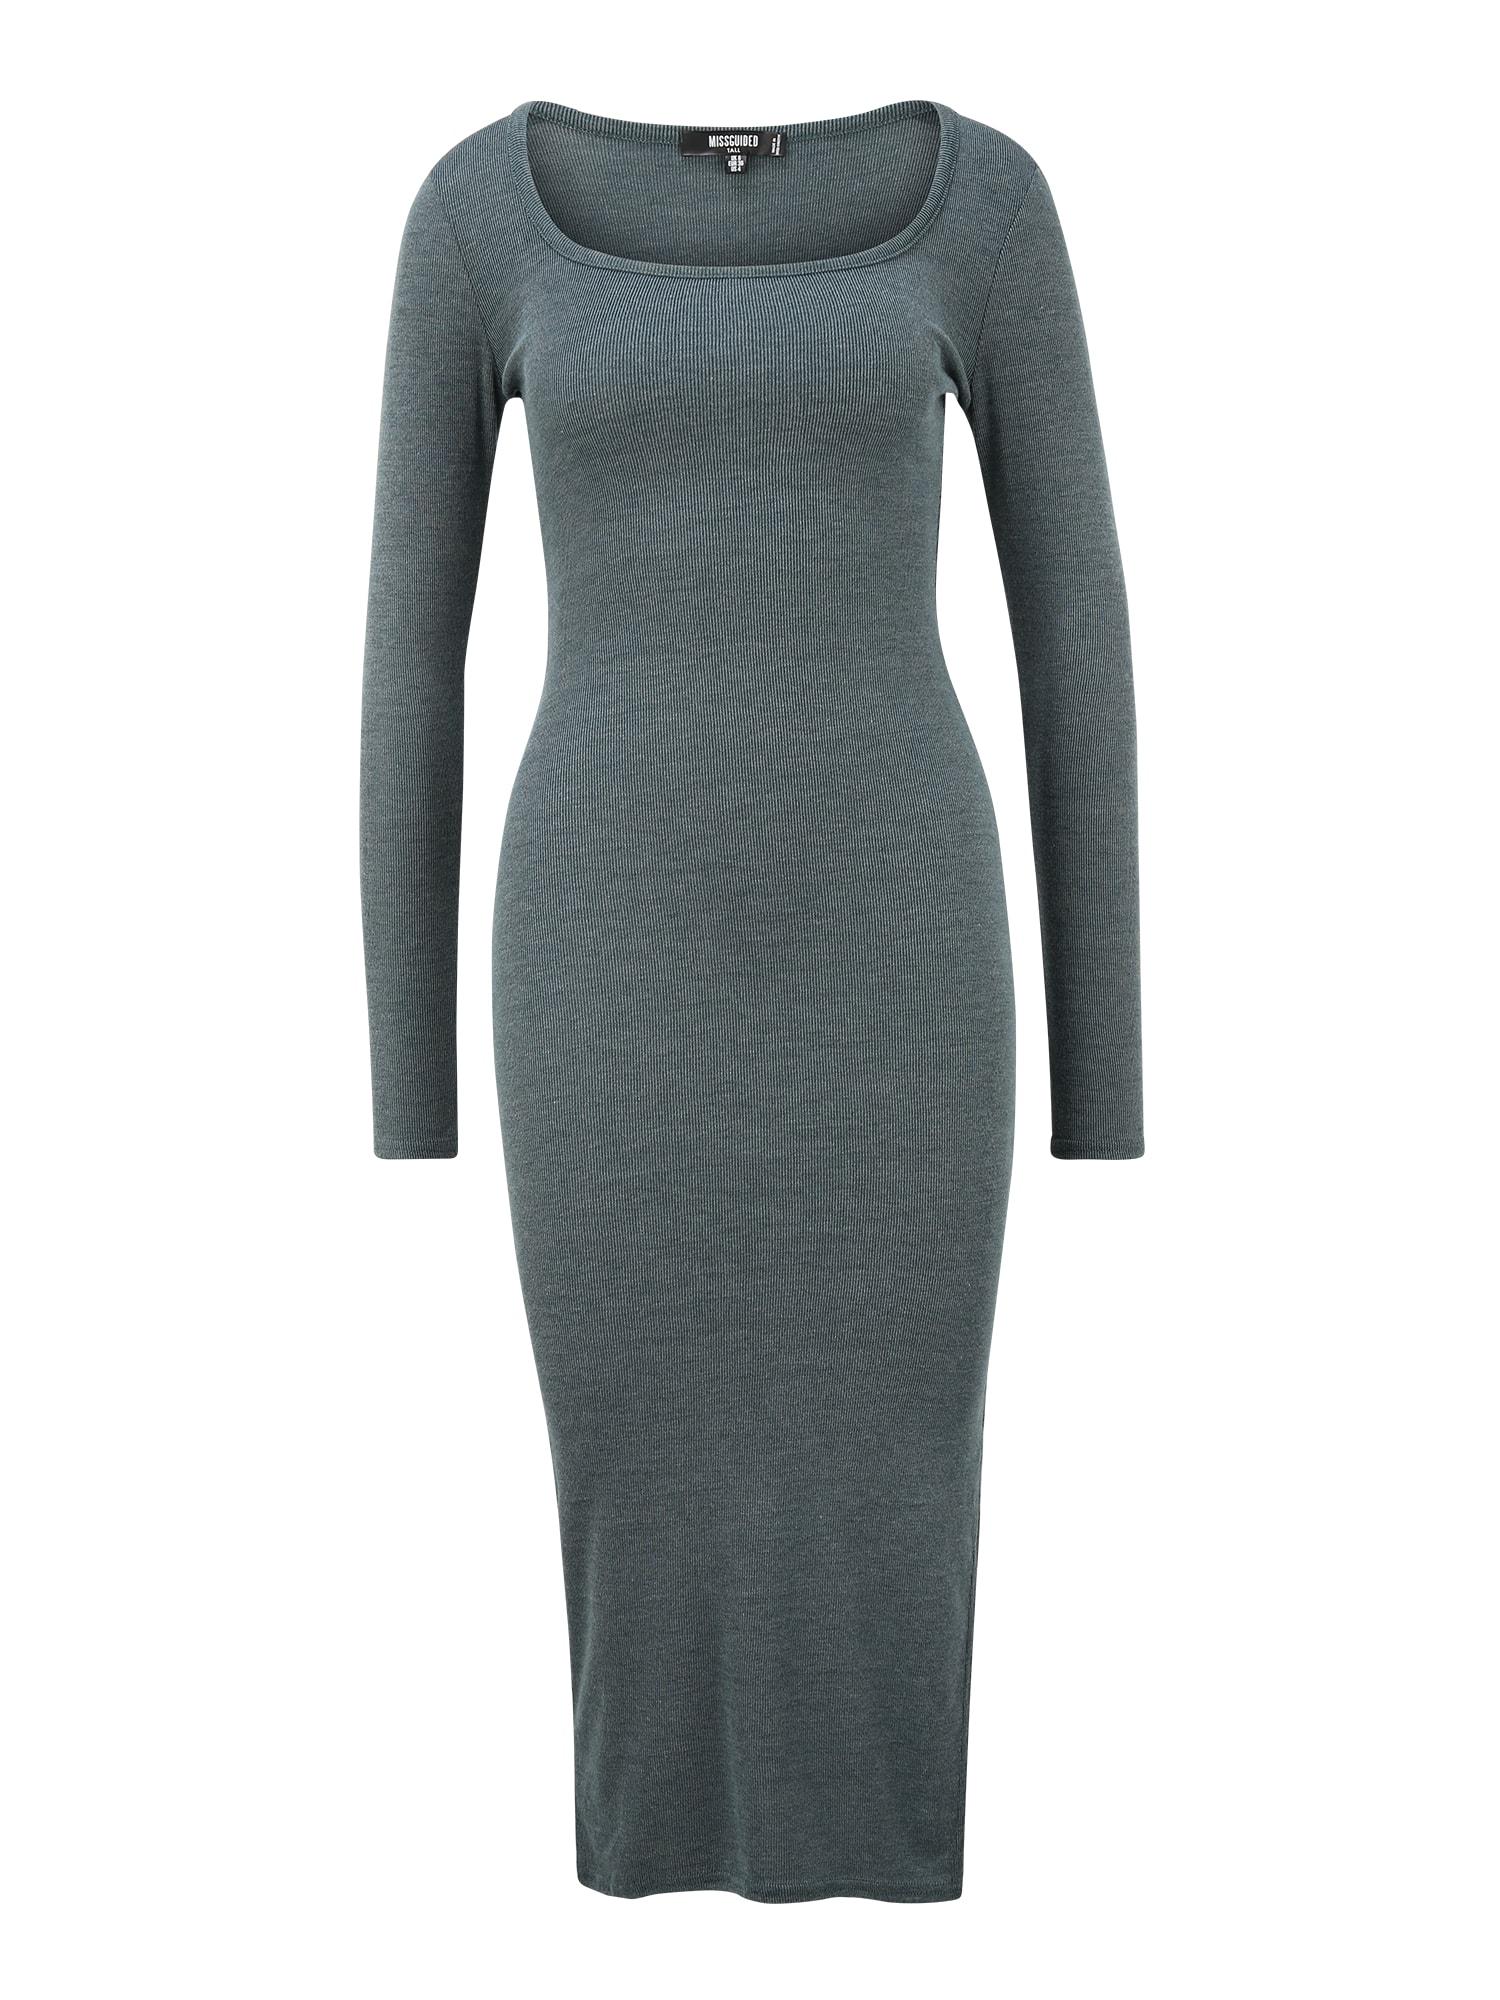 Missguided (Tall) Suknelė žalia